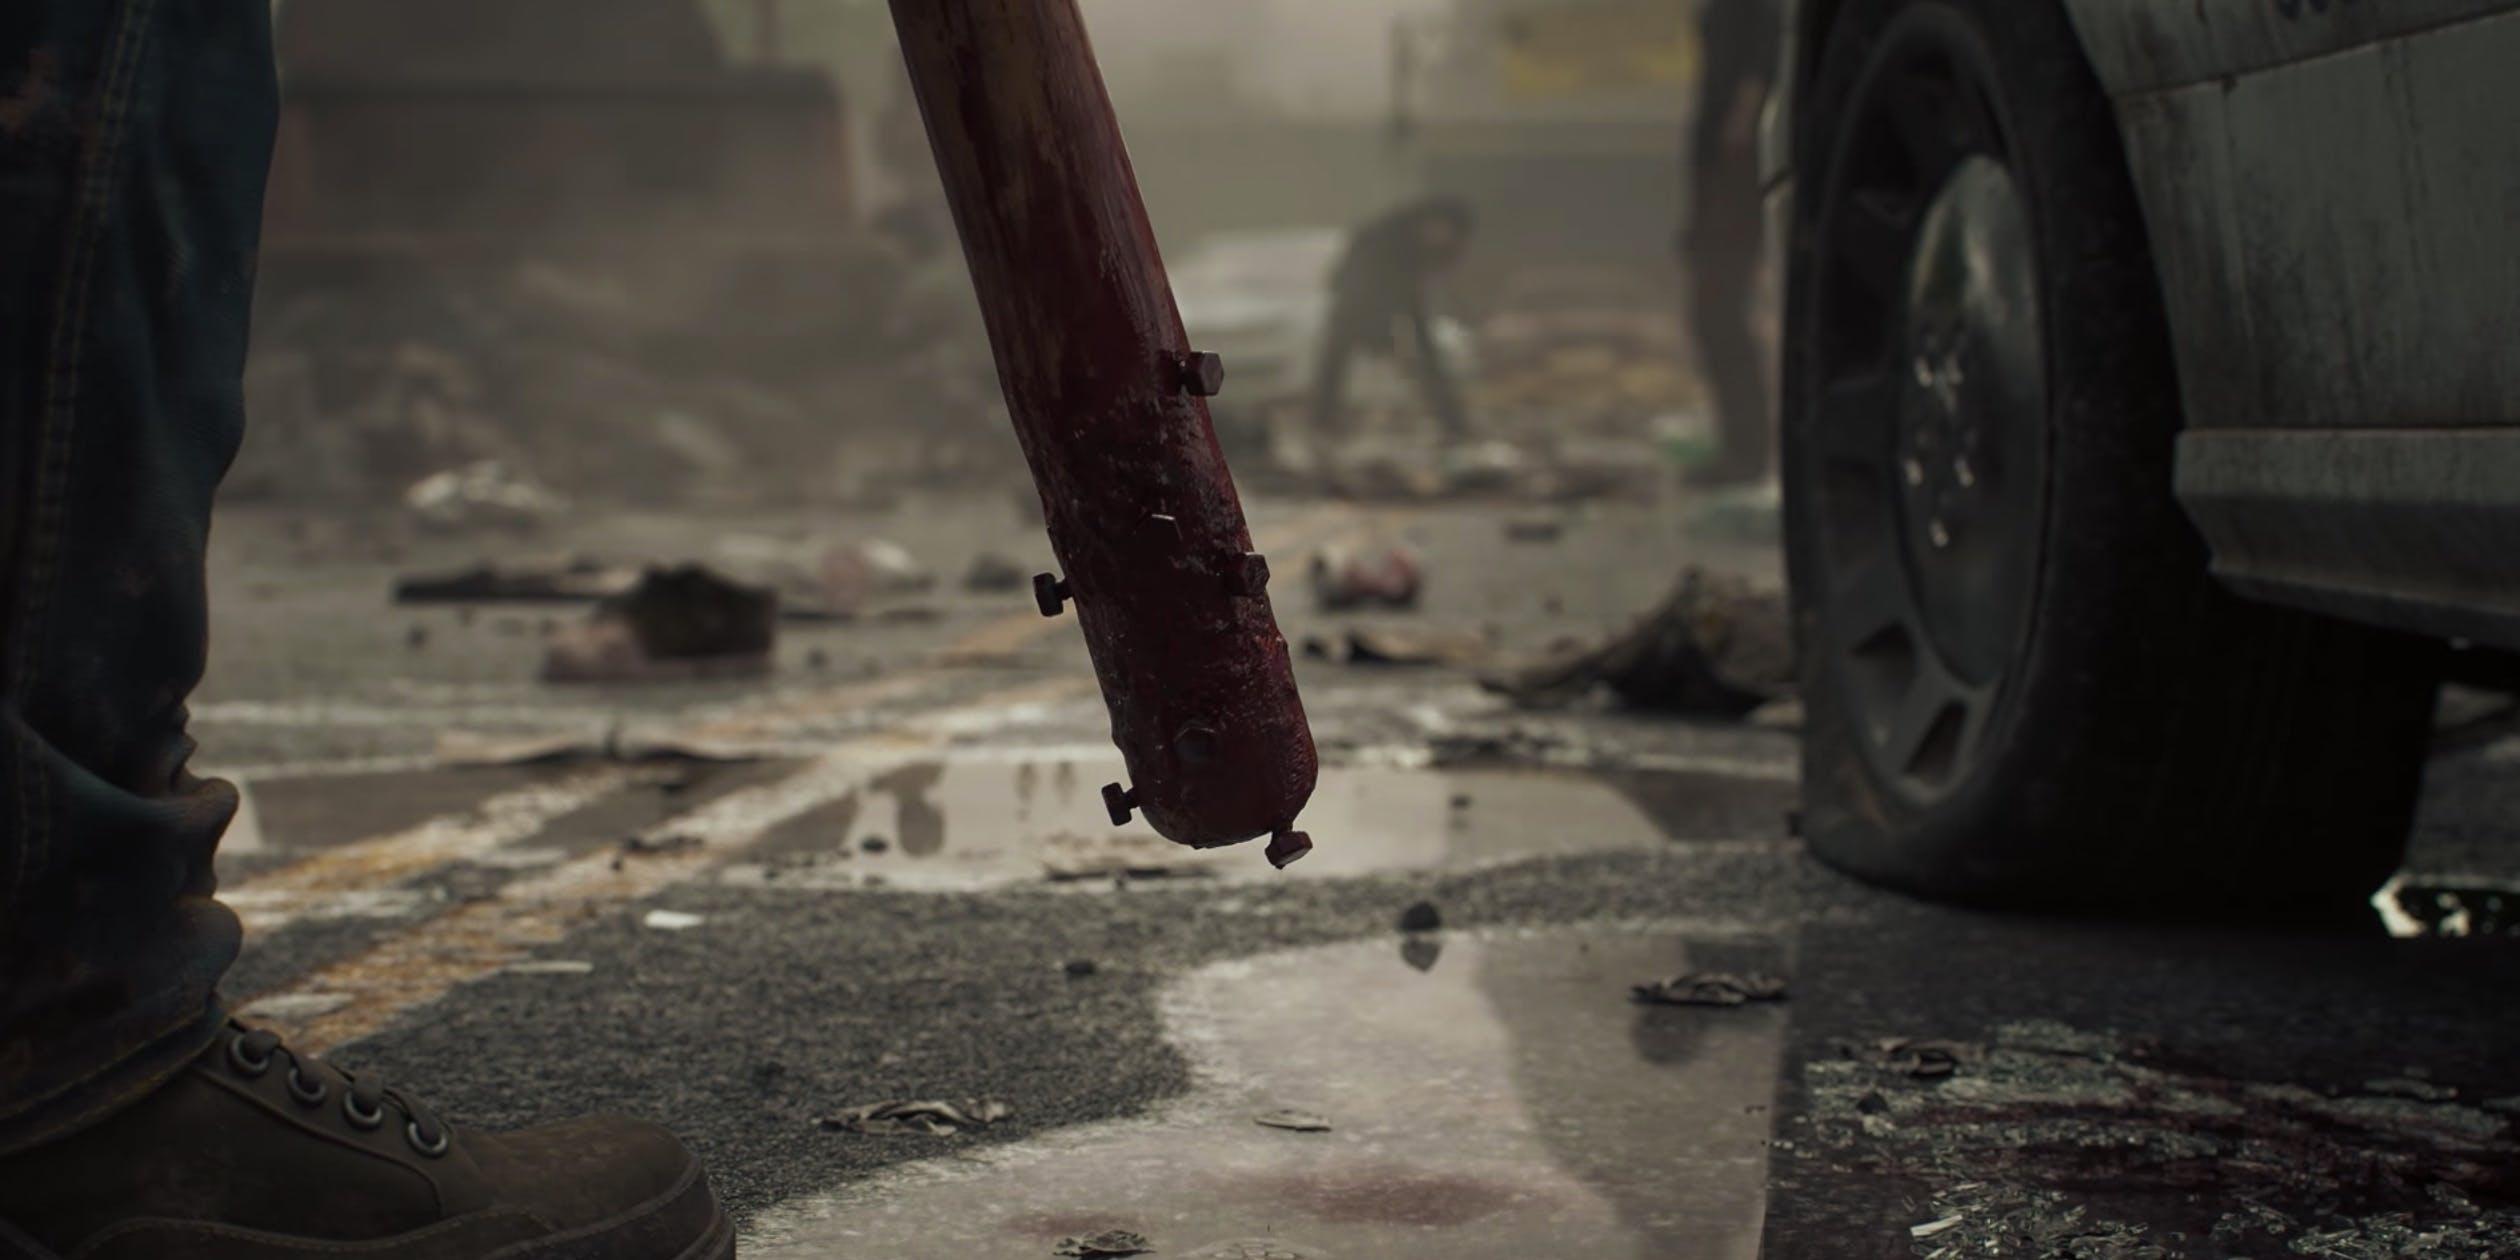 Игра «Walking Dead Overkill» Bat Overkill представляет новую игру «Walking Dead» с трейлером